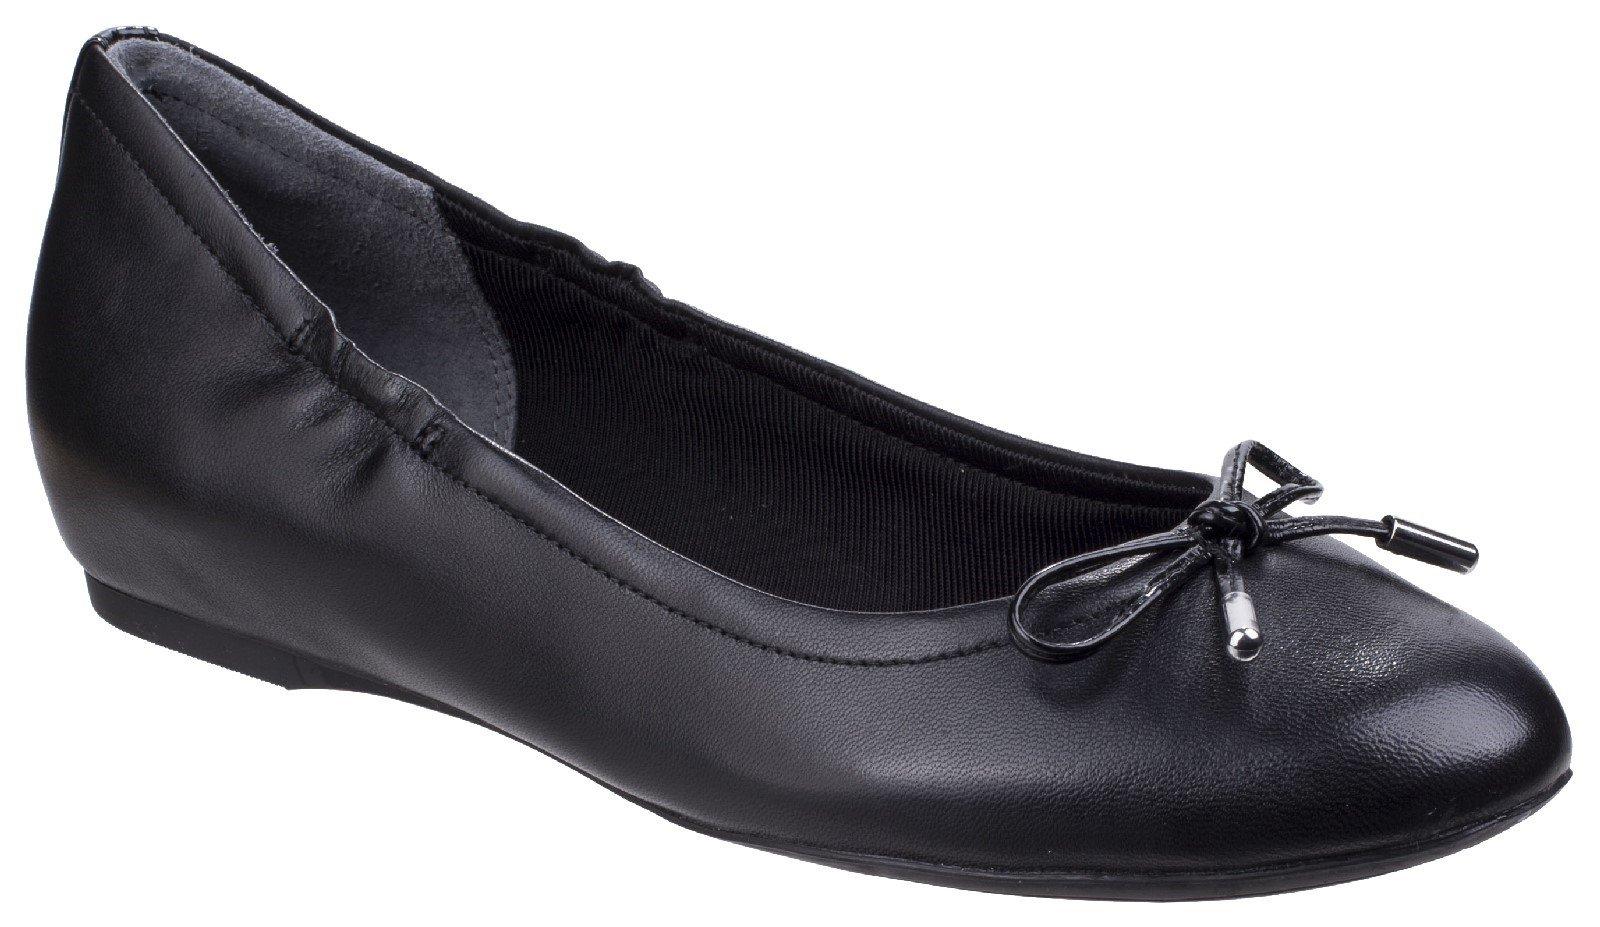 Rockport Women's Tied Ballet Flats Various Colours 26799 - Black 4